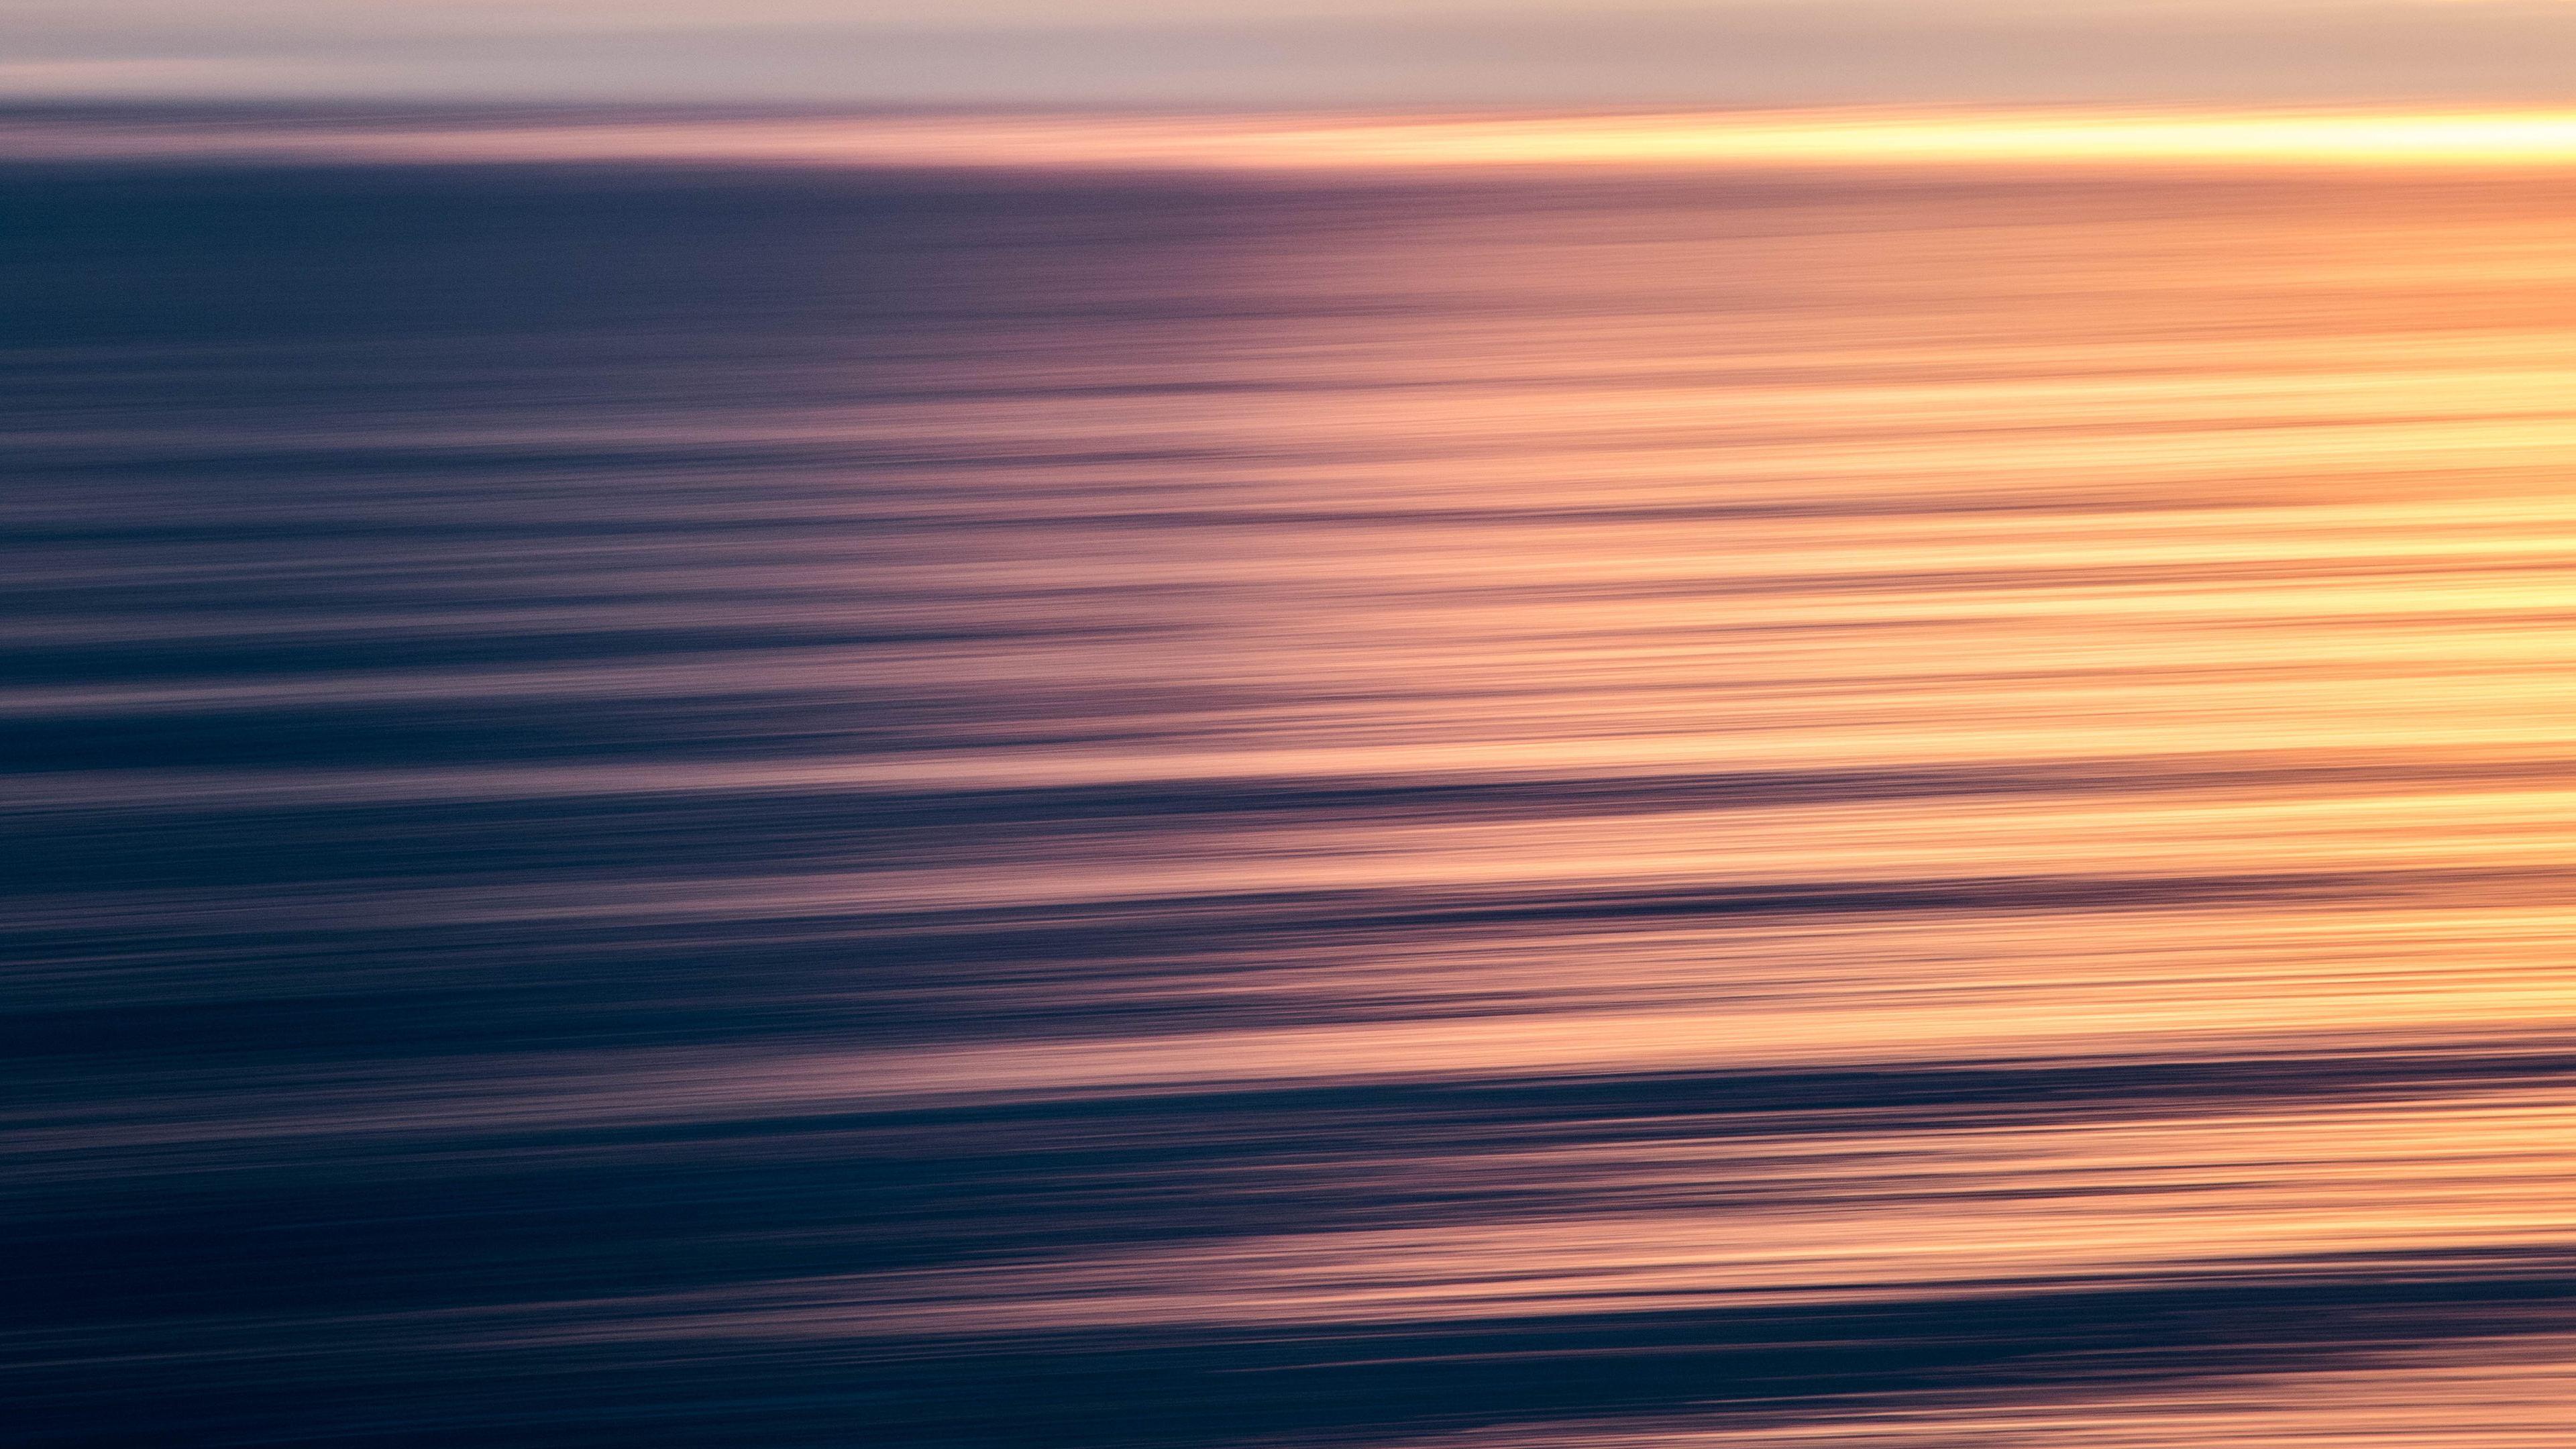 ocean minimal 4k 1540140113 - Ocean Minimal 4k - ocean wallpapers, nature wallpapers, minimalism wallpapers, hd-wallpapers, 5k wallpapers, 4k-wallpapers